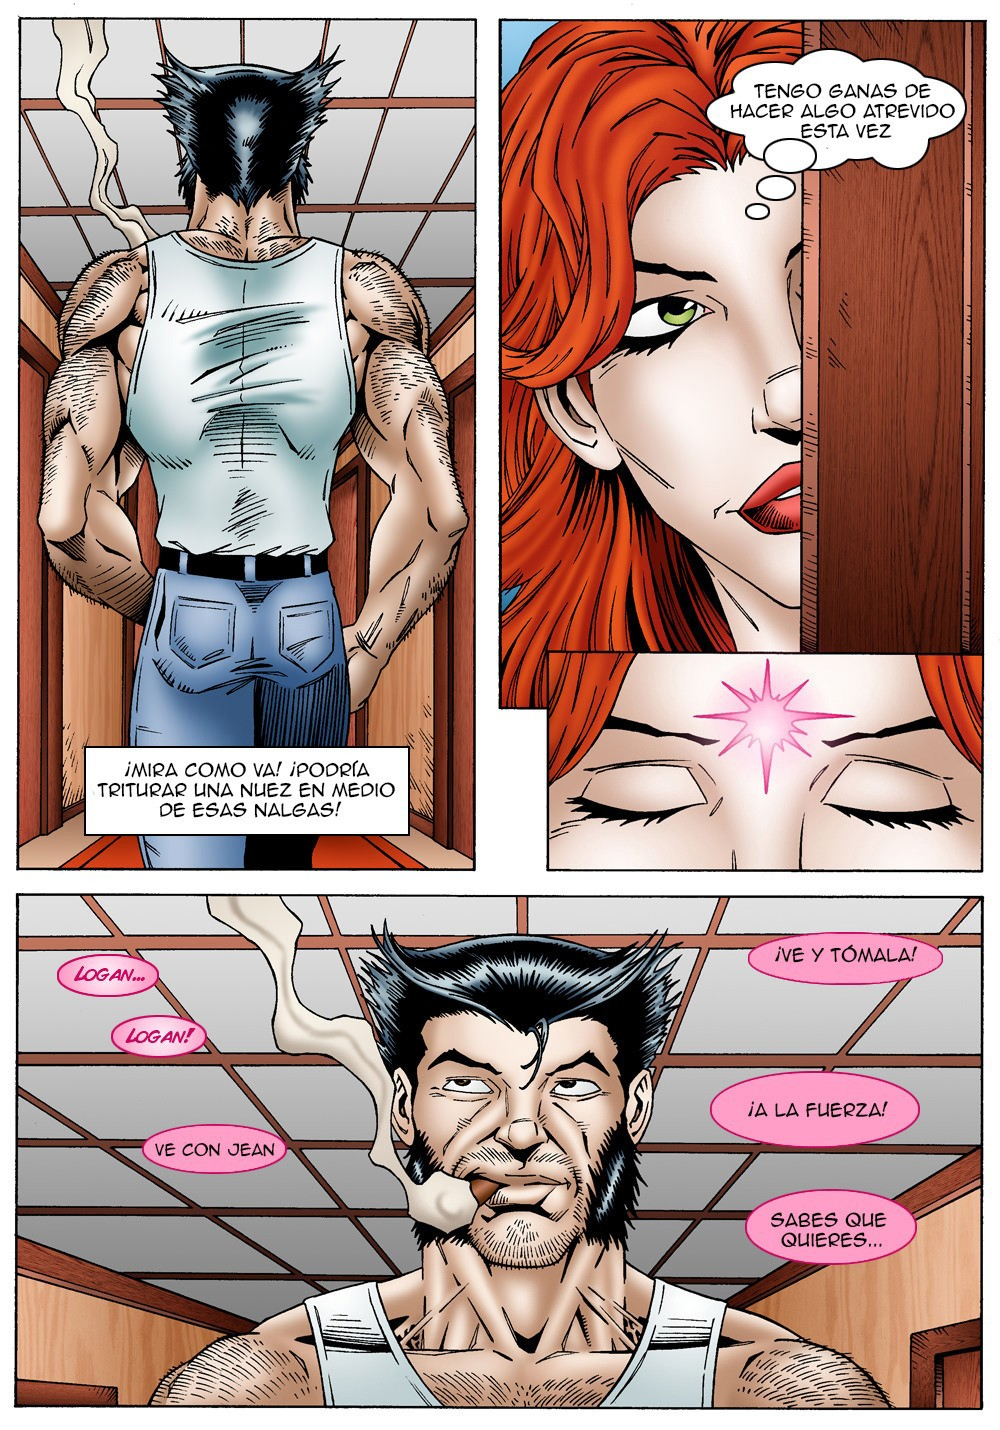 Jean-Grey-and-Logan-06.jpg